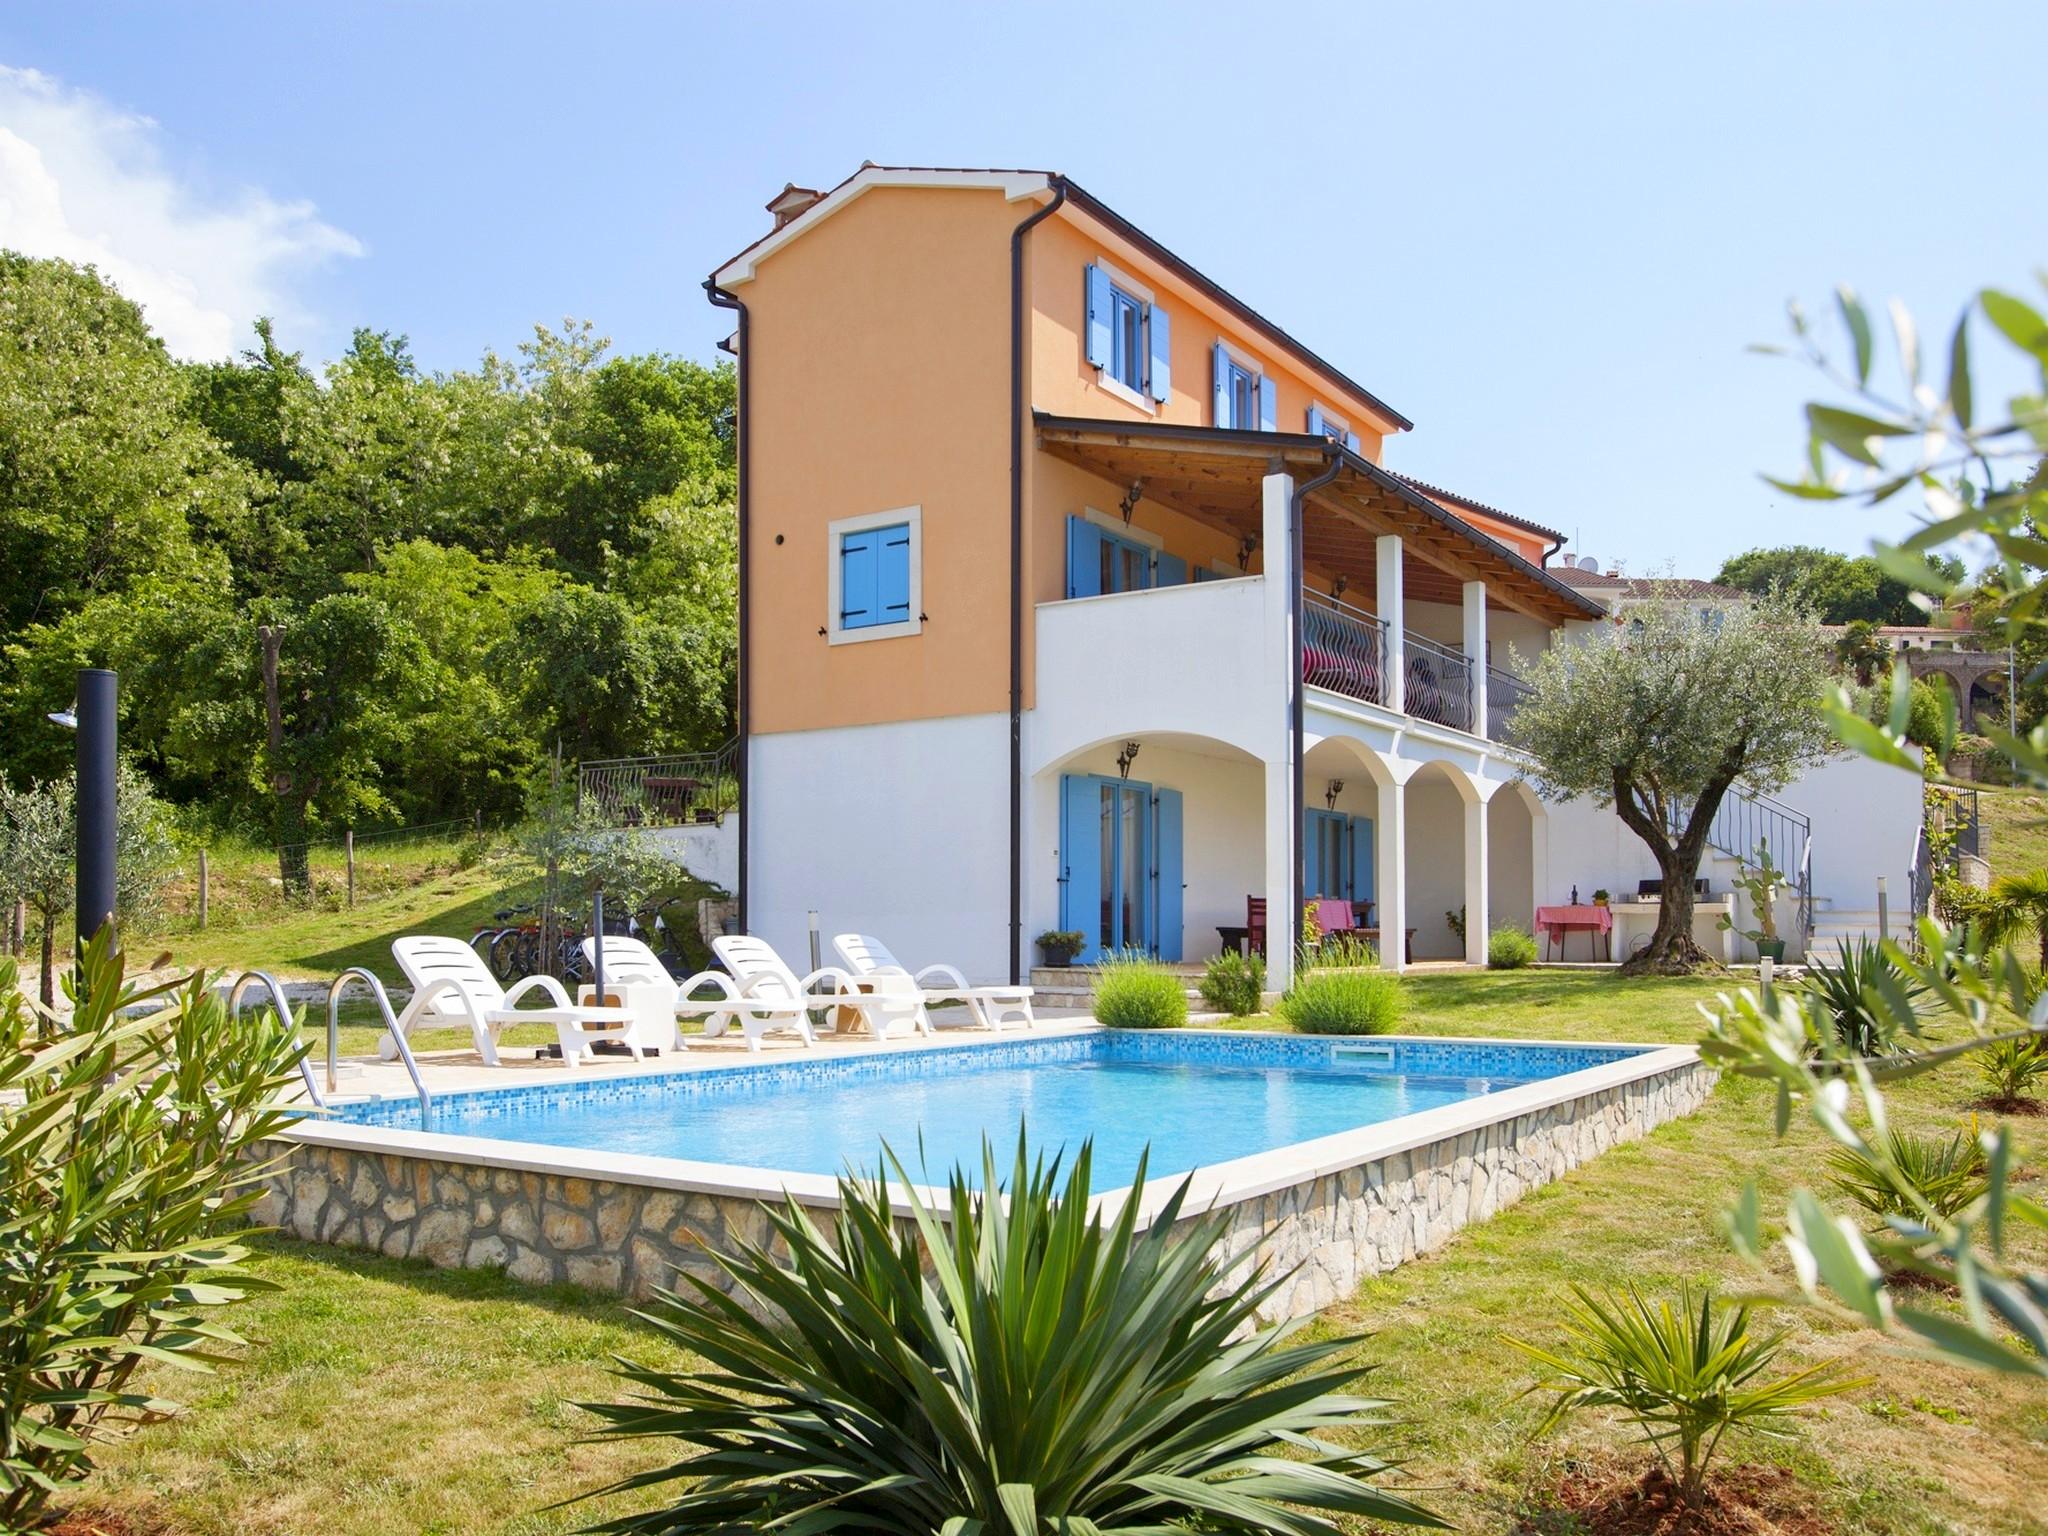 Ferienhaus Bruno, Kua za odmor s bazenom (2204668), Mugeba, , Istrien, Kroatien, Bild 2